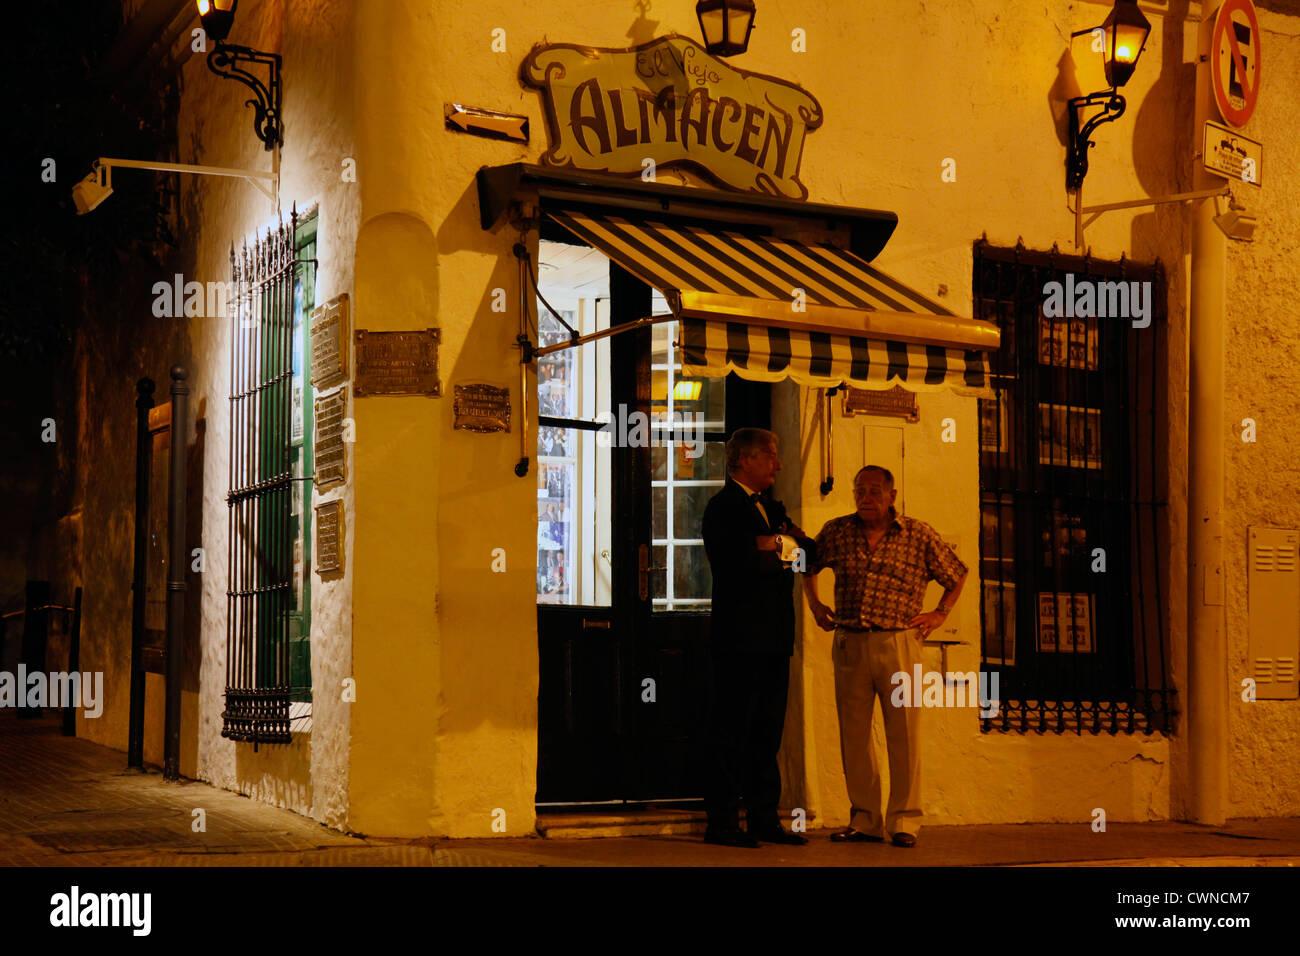 El Viejo Almacen, Buenos Aires, Argentinien. Stockbild